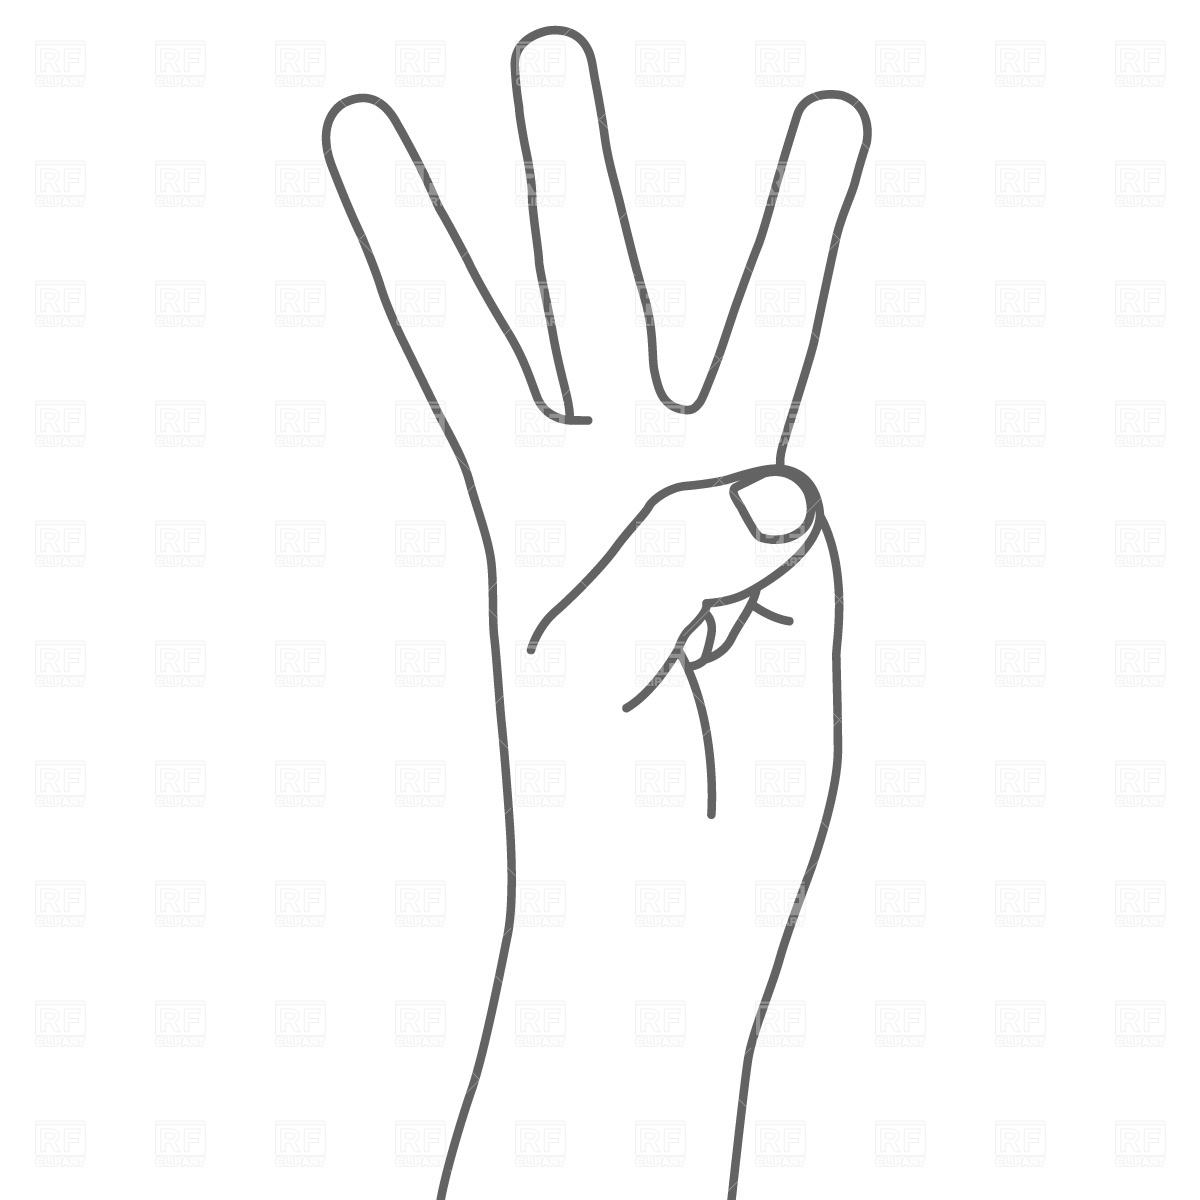 Finger Clip Art Free A Hand Pointing Upward